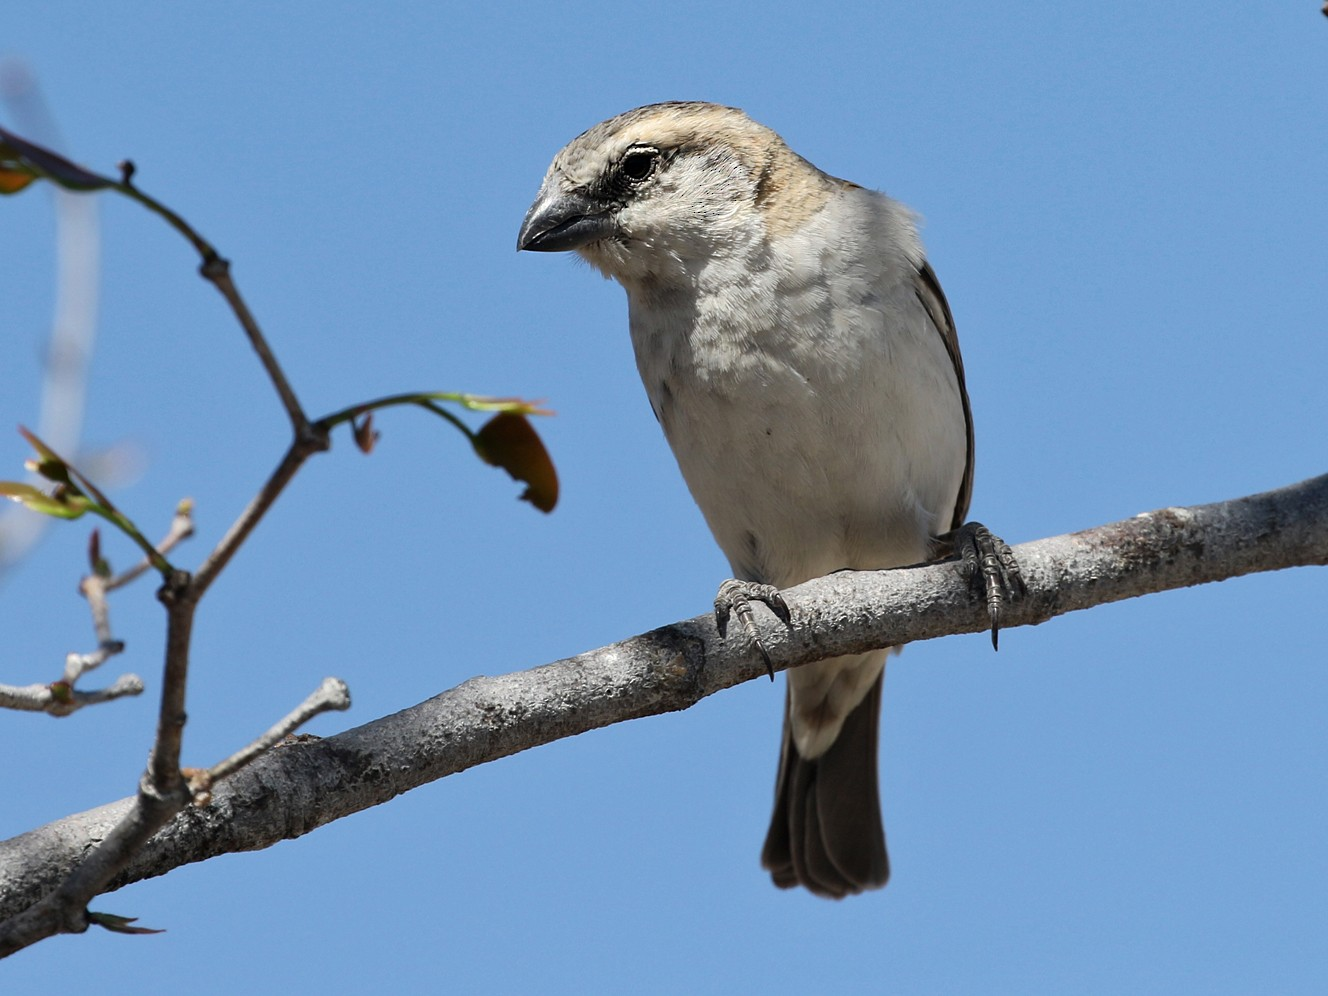 Great Rufous Sparrow - Charley Hesse https://www.schoolofbirding.com/